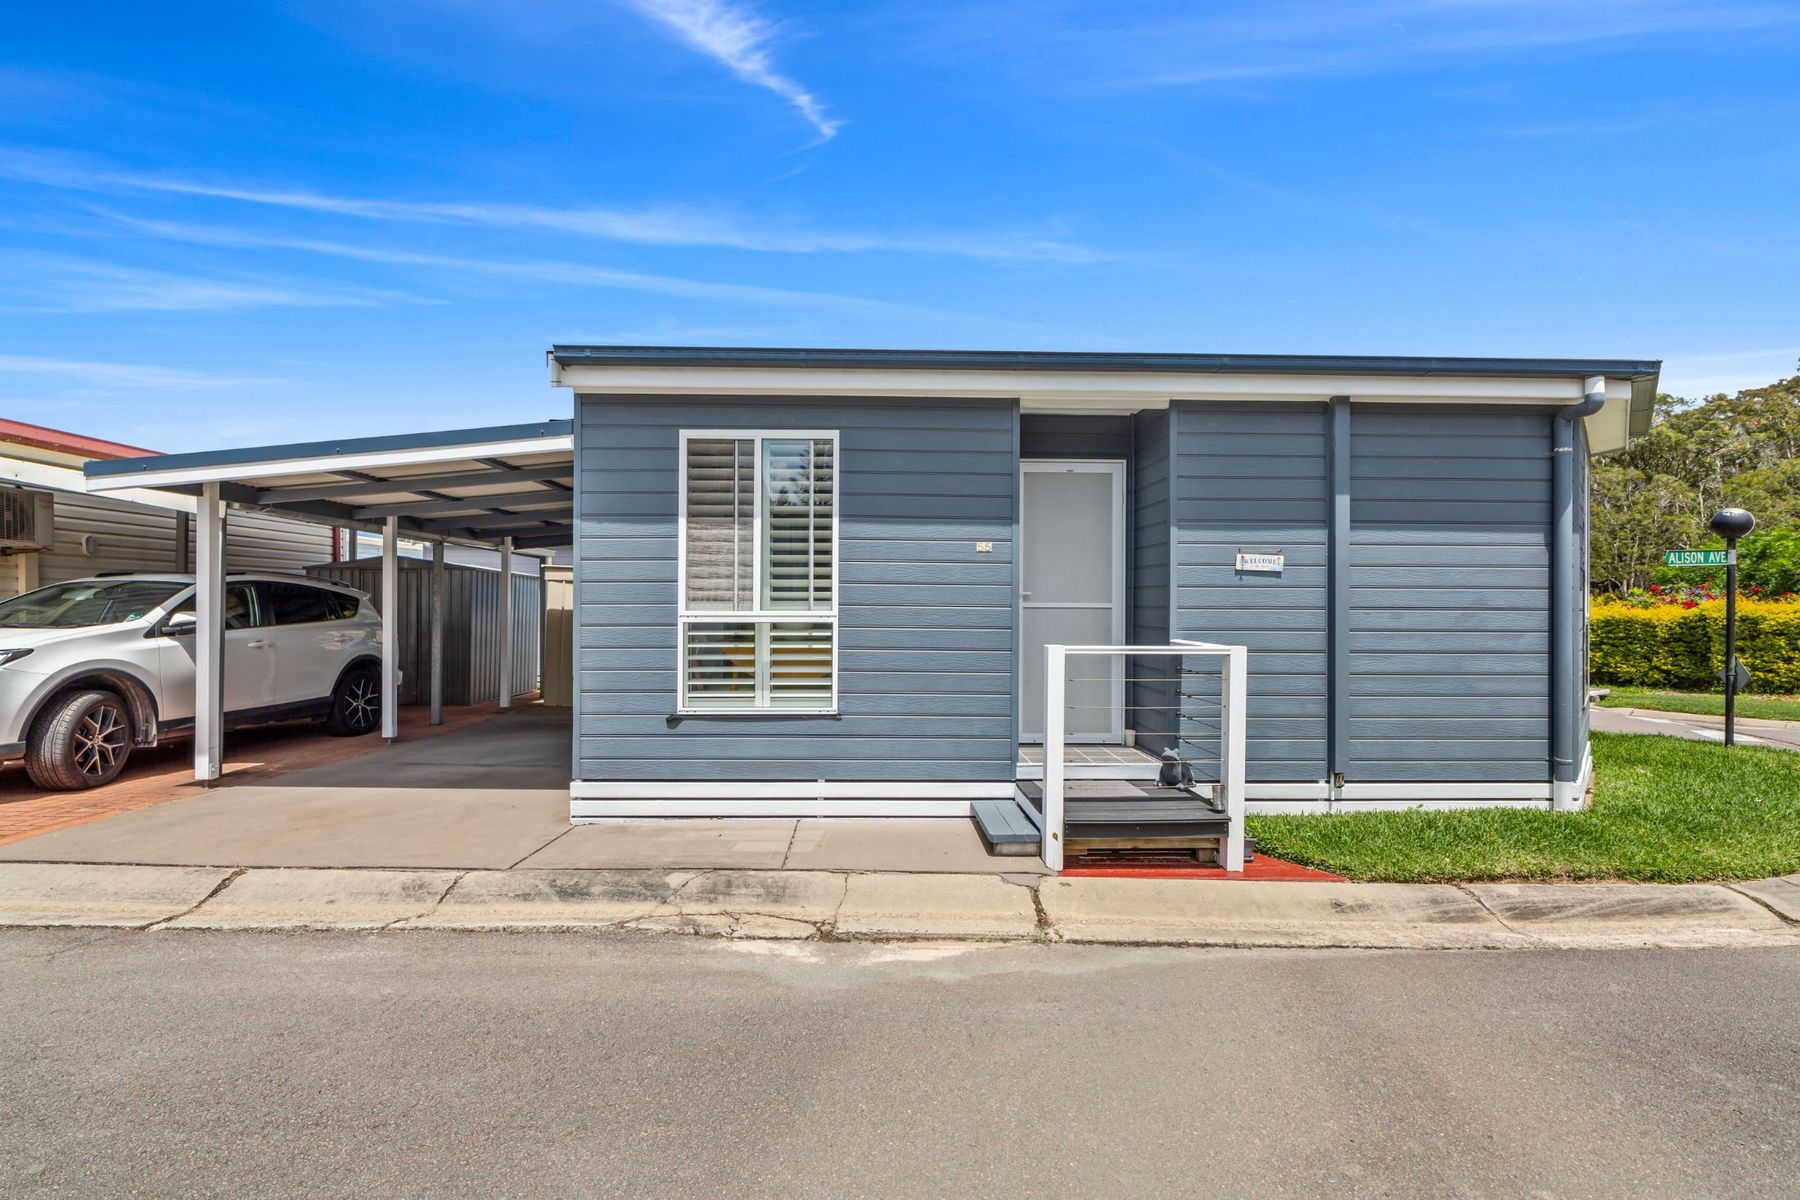 55/1A Kalaroo Road, Redhead, NSW 2290